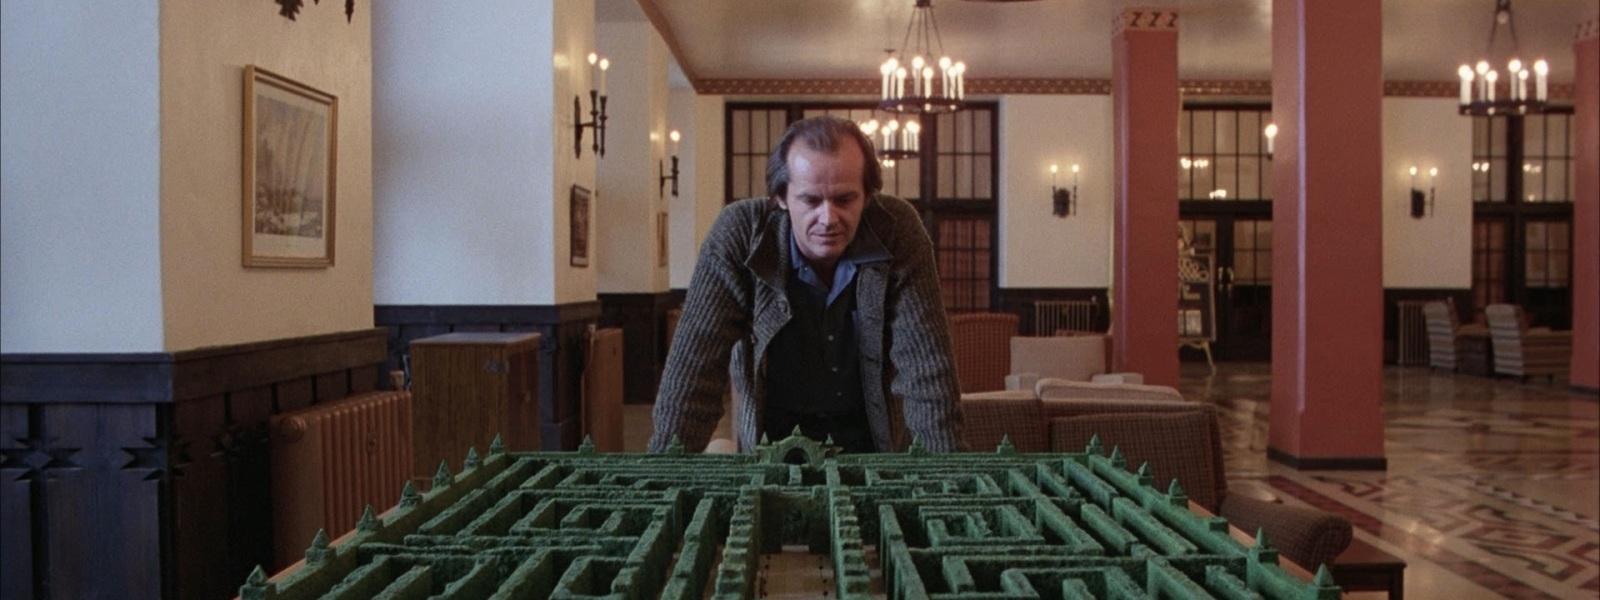 Jack Nicholson as Jack Torrance in The Shining (dir. Stanley Kubrick, 1980).